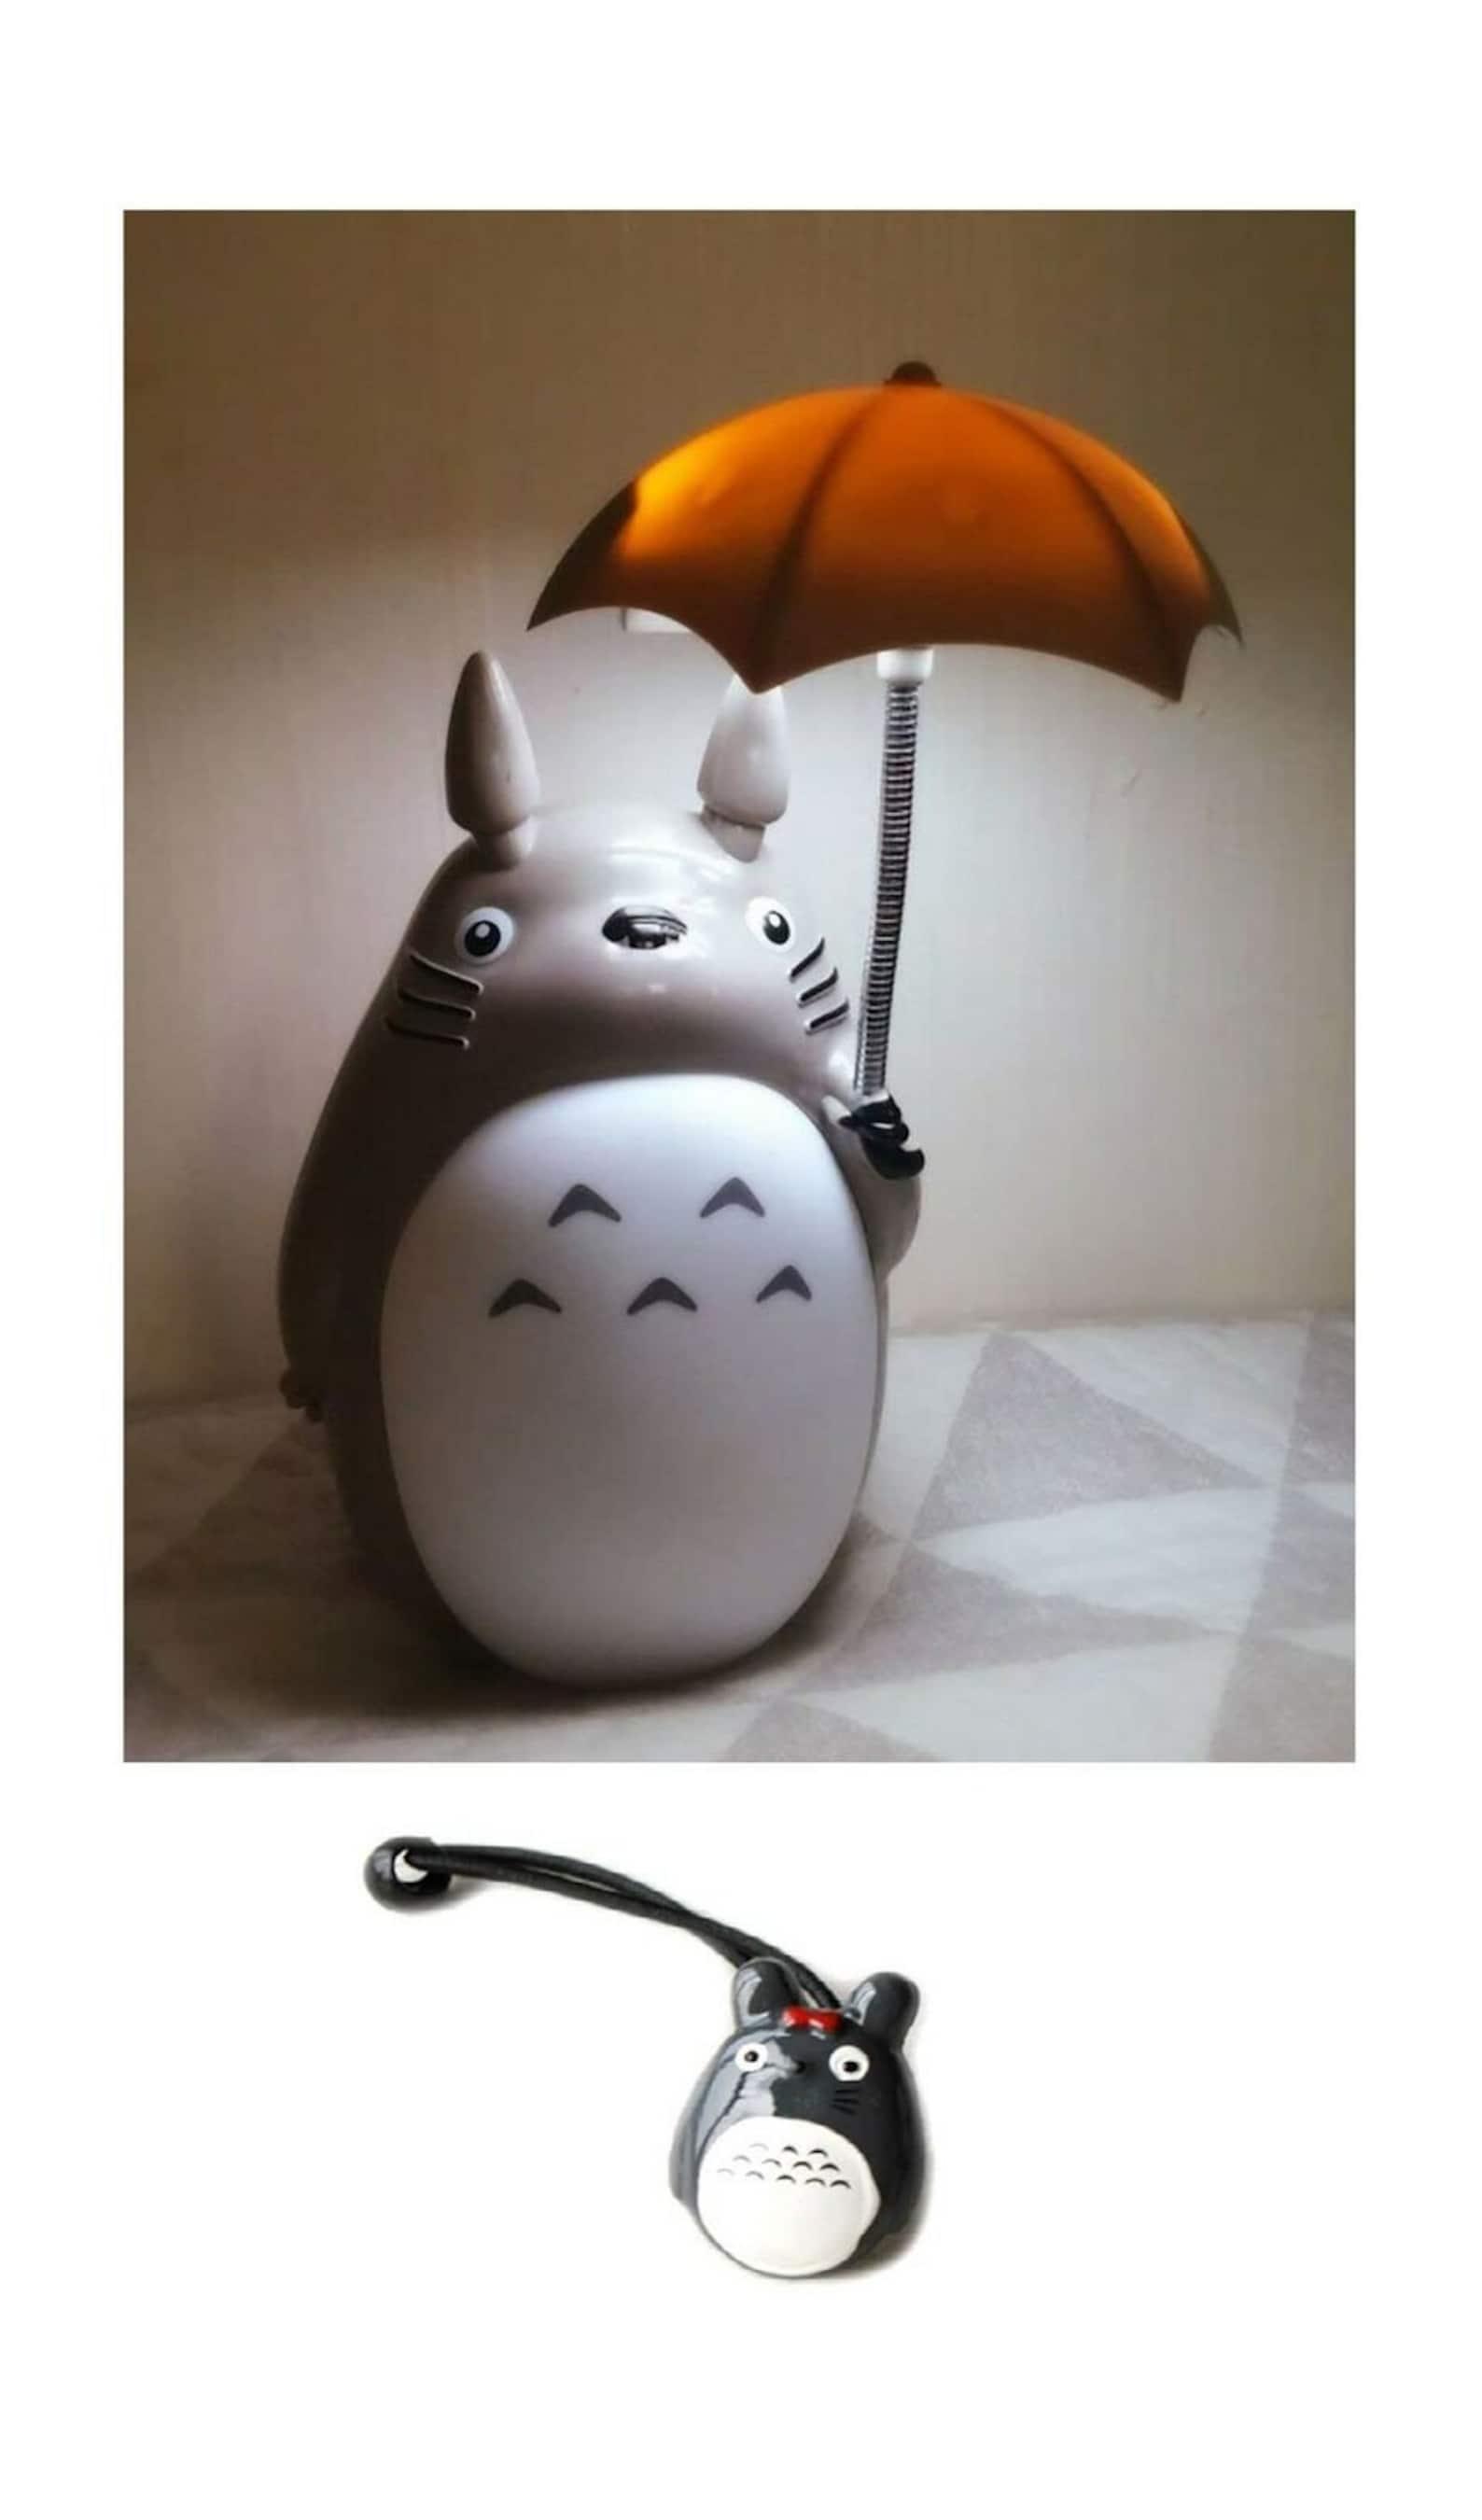 tudio Ghibli My Neighbour Totoro USB Led Night Light/Lamp for Kid's Bedroom